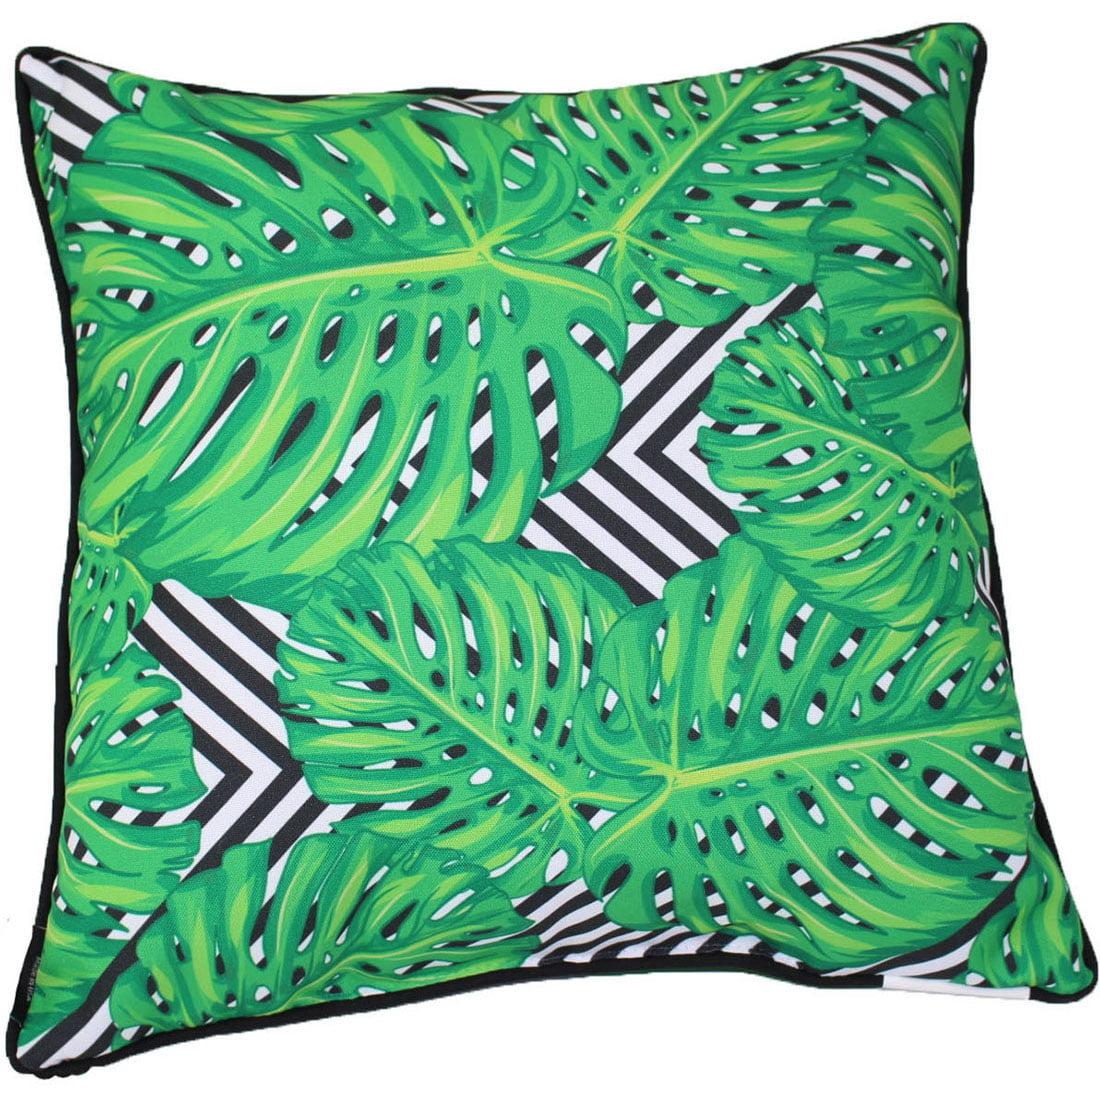 "lava Geo Mon Indoor Outdoor Pillow, 18"" x 18"" by Lava"